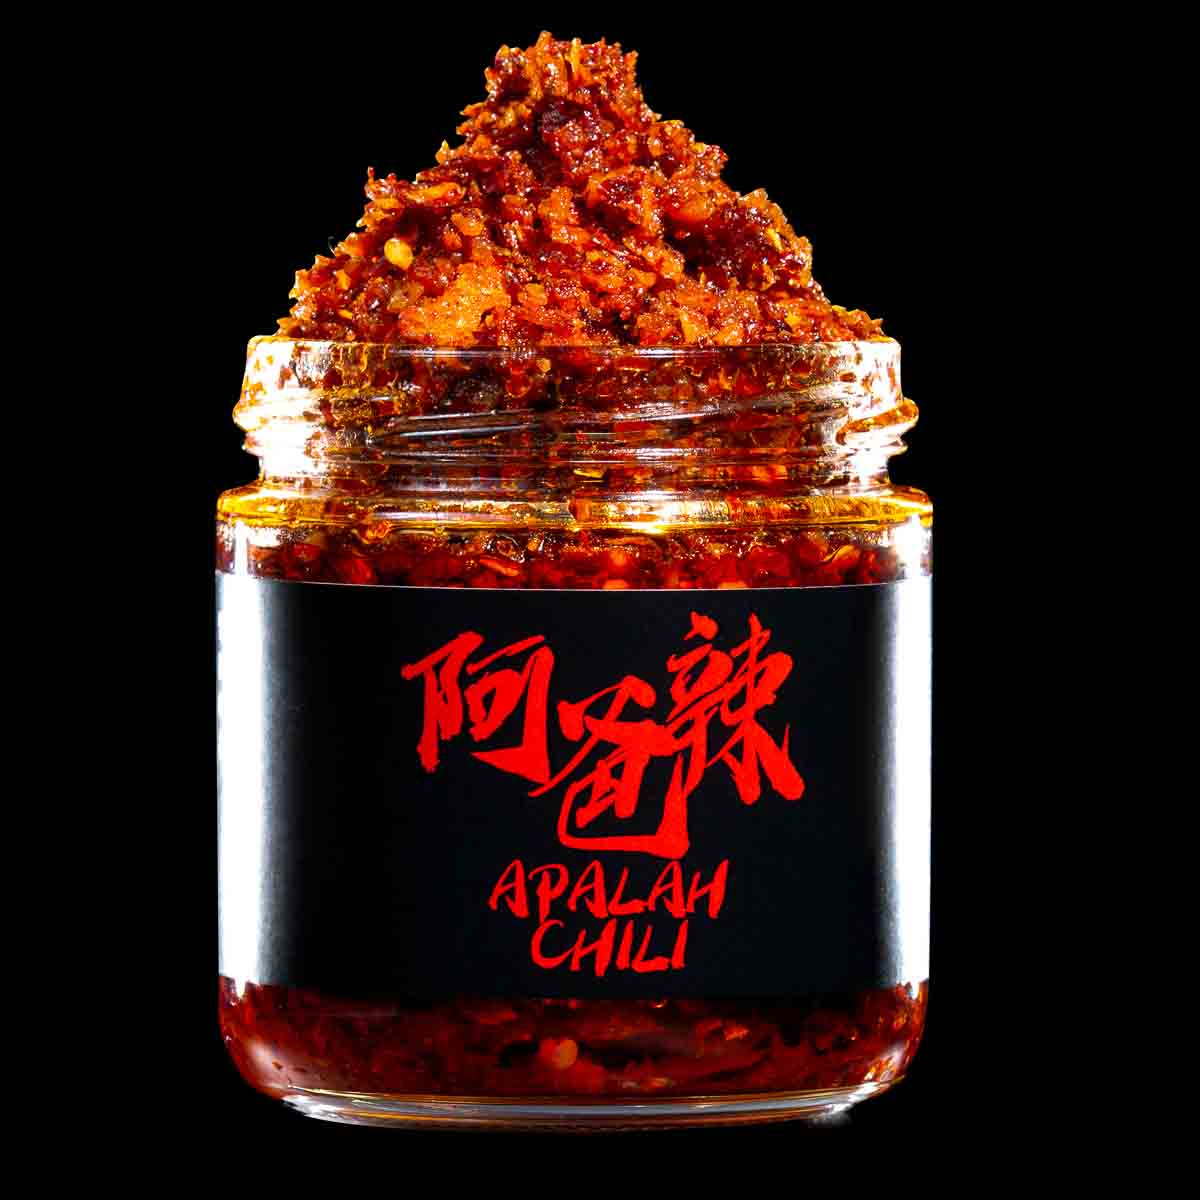 Apalah Chili Bottle Open